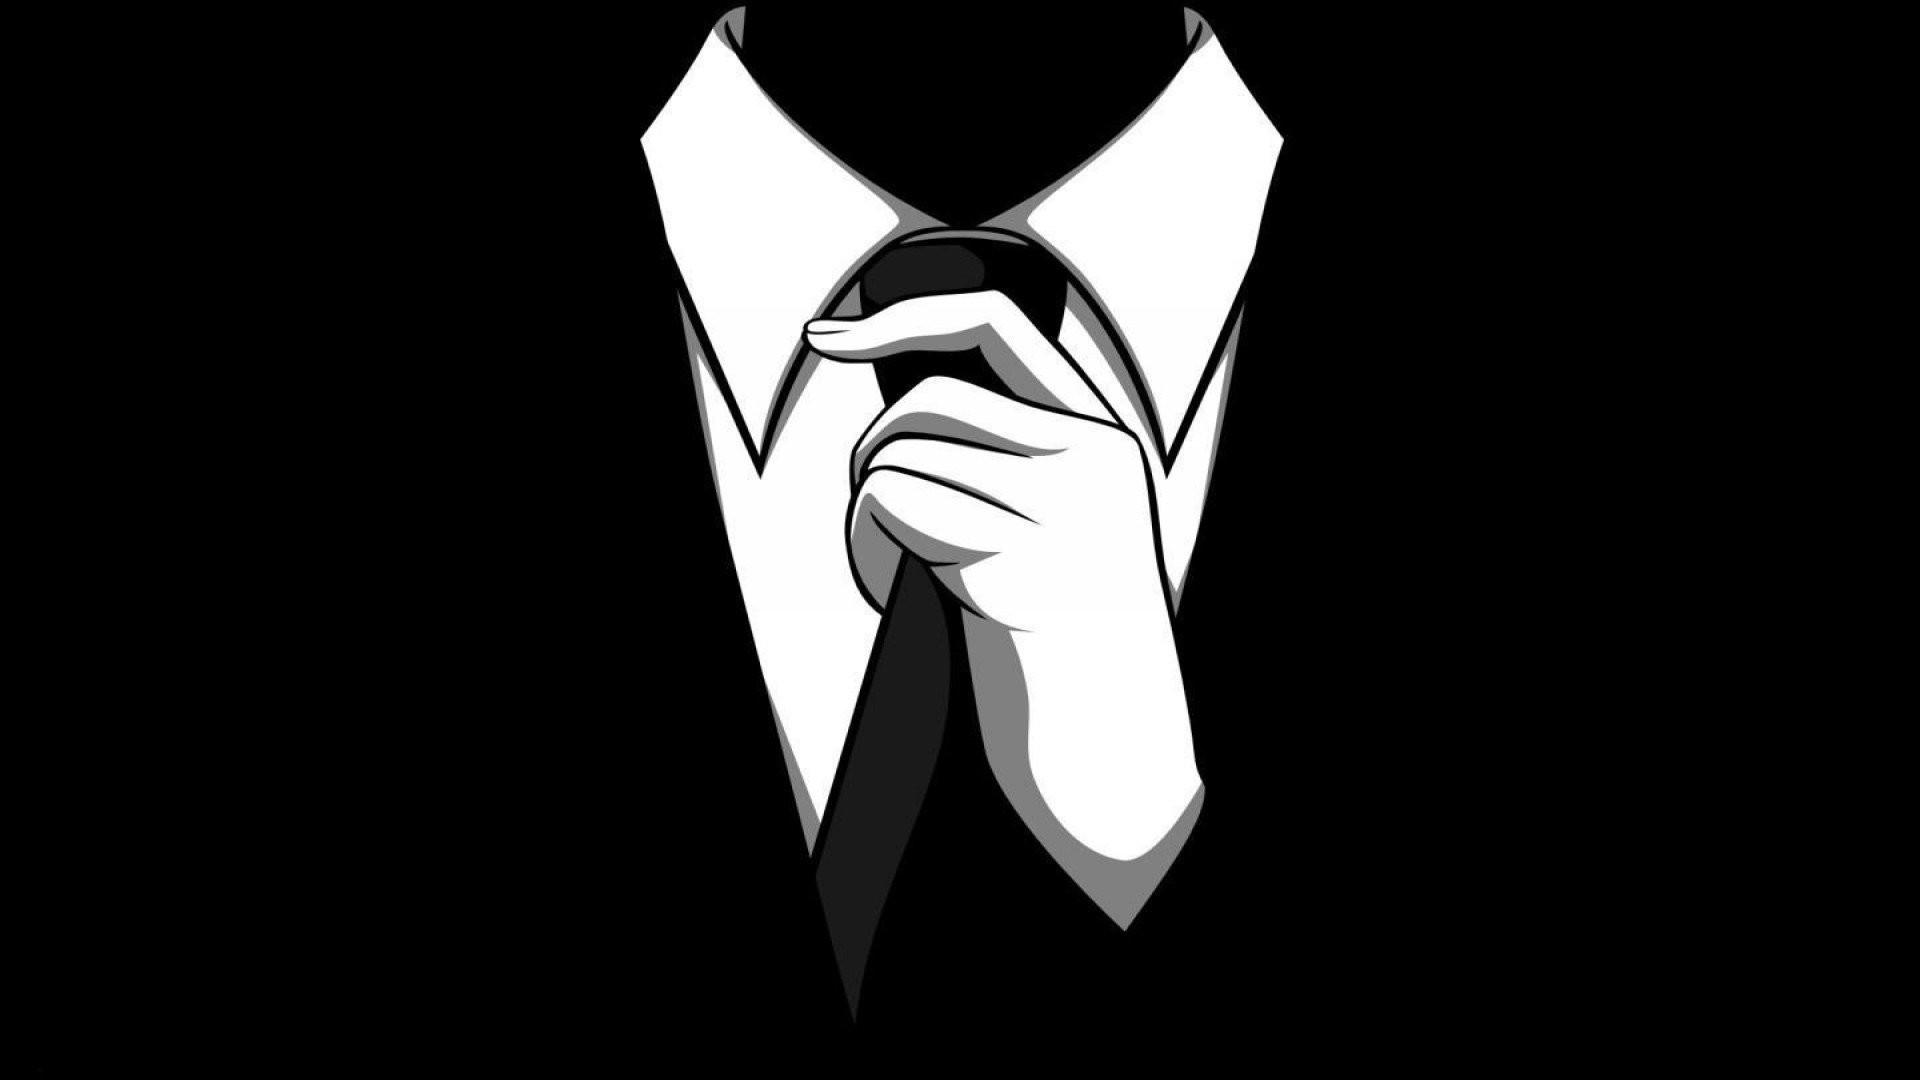 Res: 1920x1080, abstract anonymous barney stinson dark men noir scary slender man tie